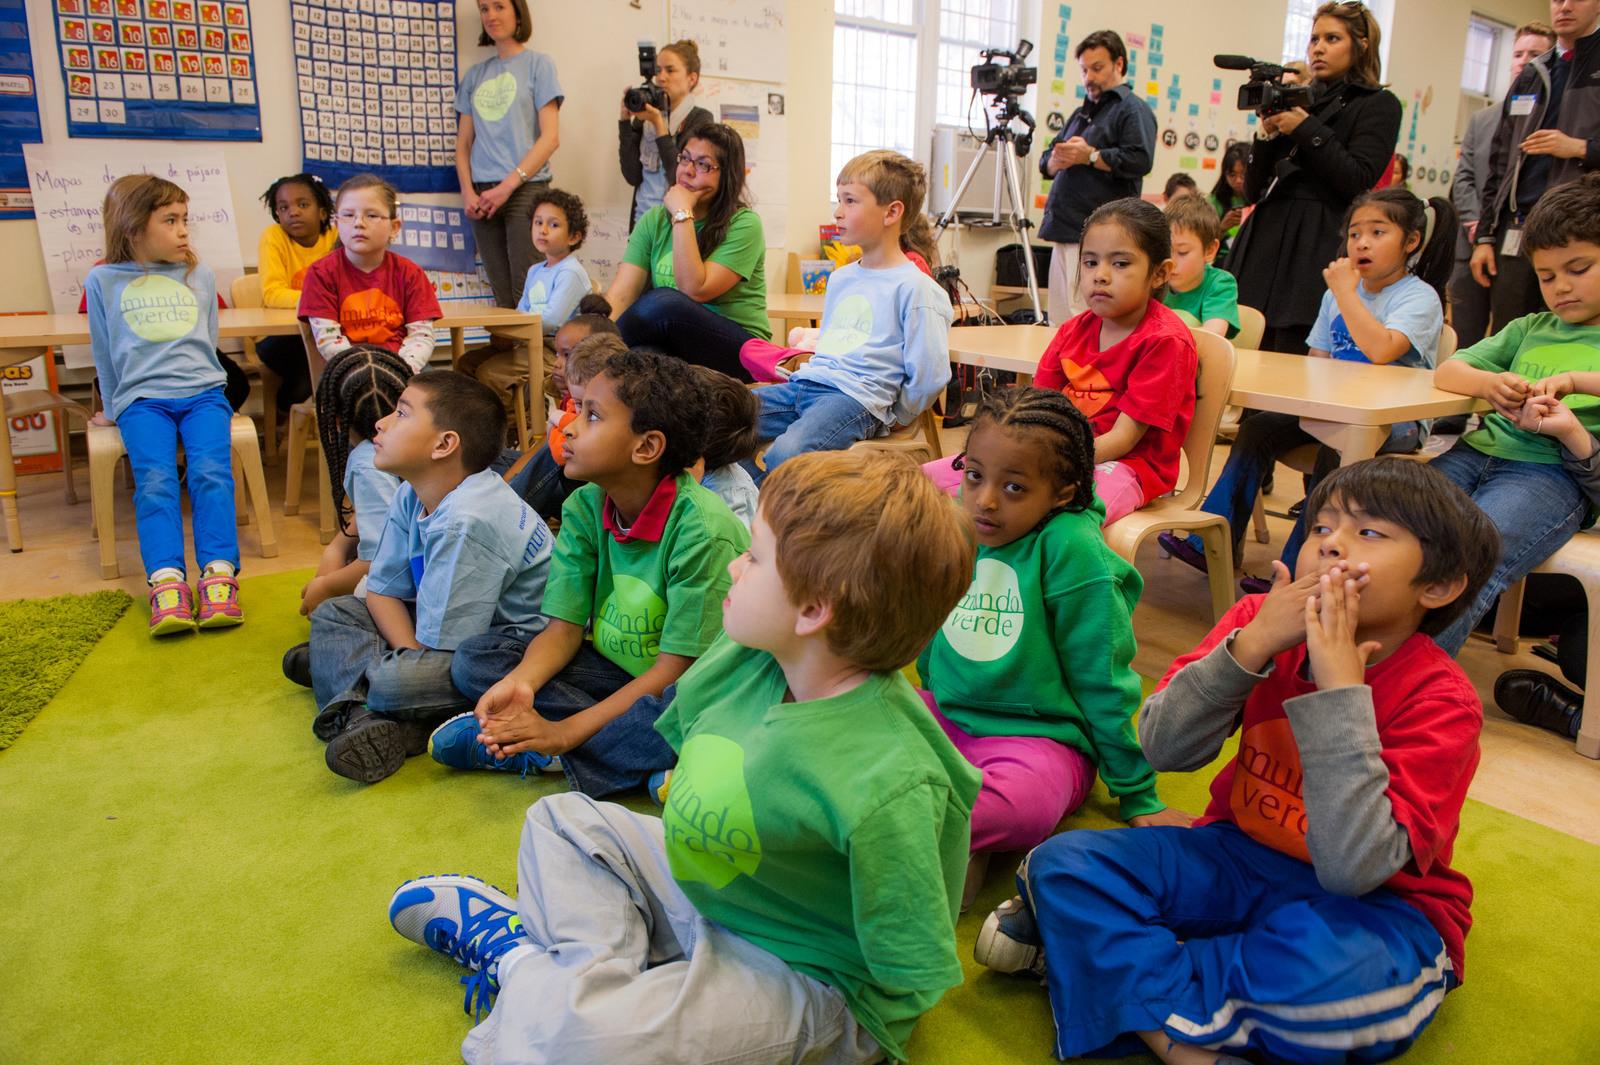 Office of the Deputy Administrator - Mundo Verde - Green Ribbon School [412-APD-1338-2013-04-22_GreenRibbonSchool_068.jpg]